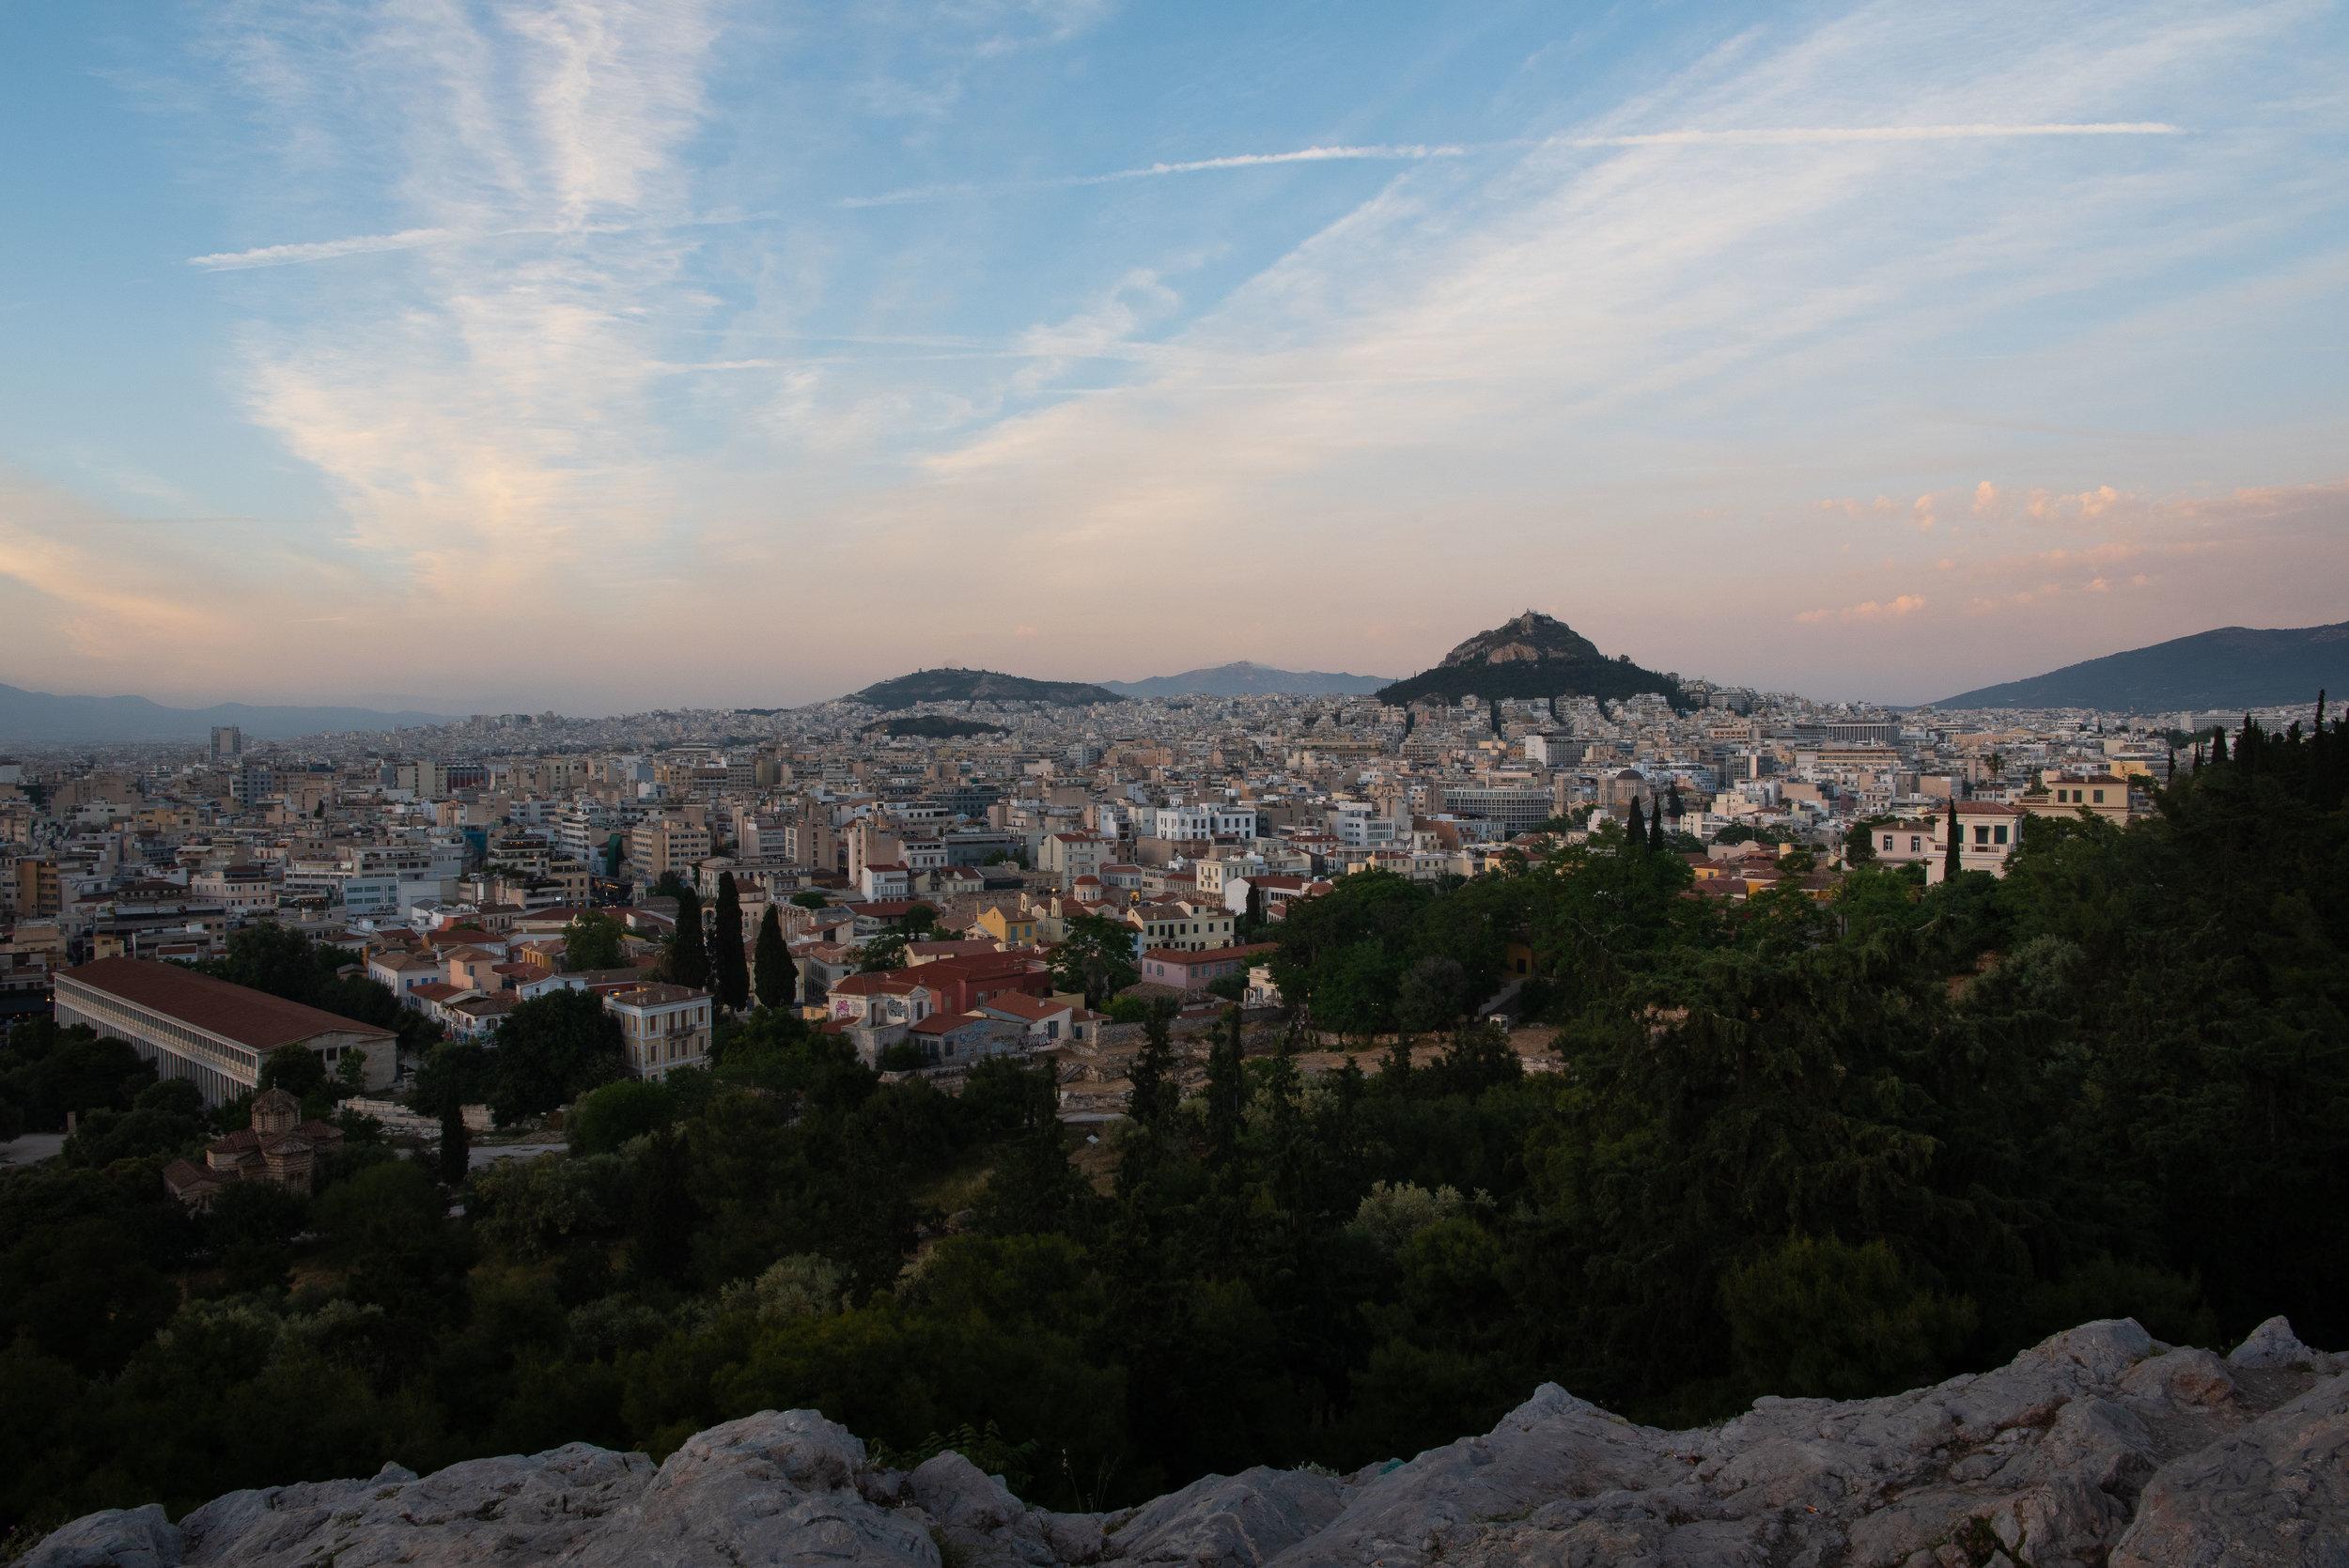 2019-May-14-Athens-Greece-237.jpg